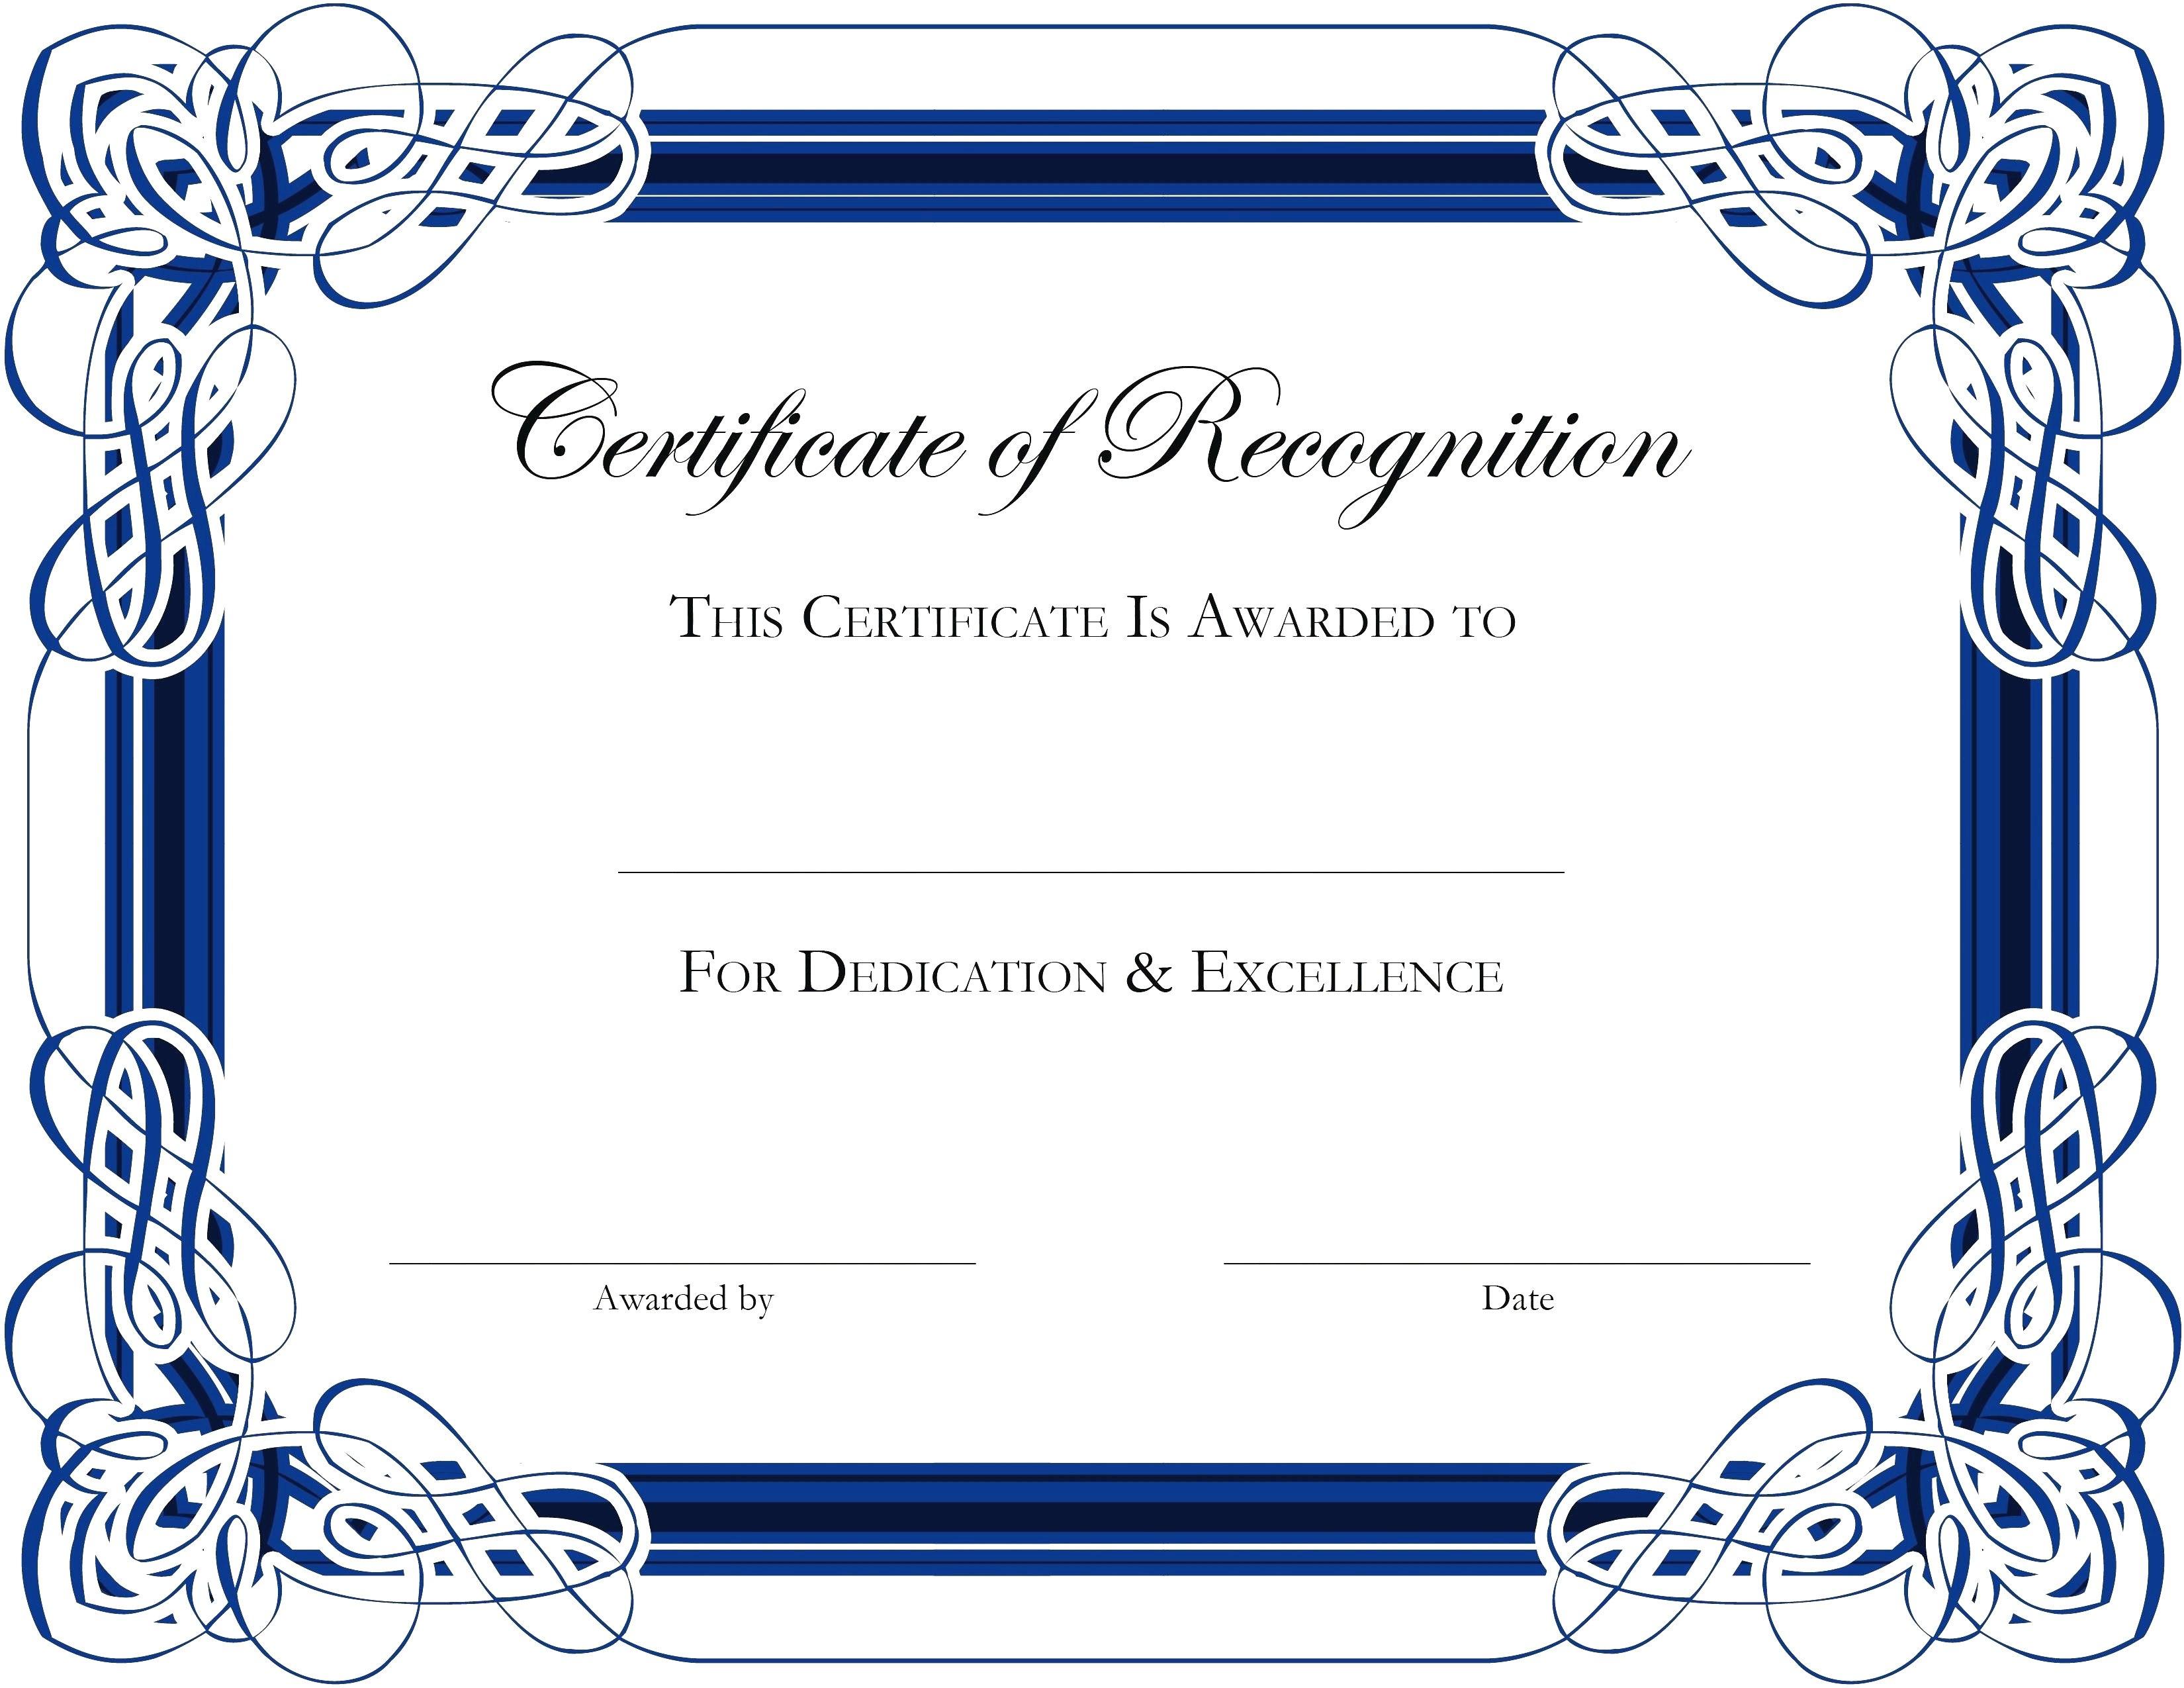 Certificate Templates In Word   Certificatetemplateword Pertaining To Award Certificate Templates Word 2007